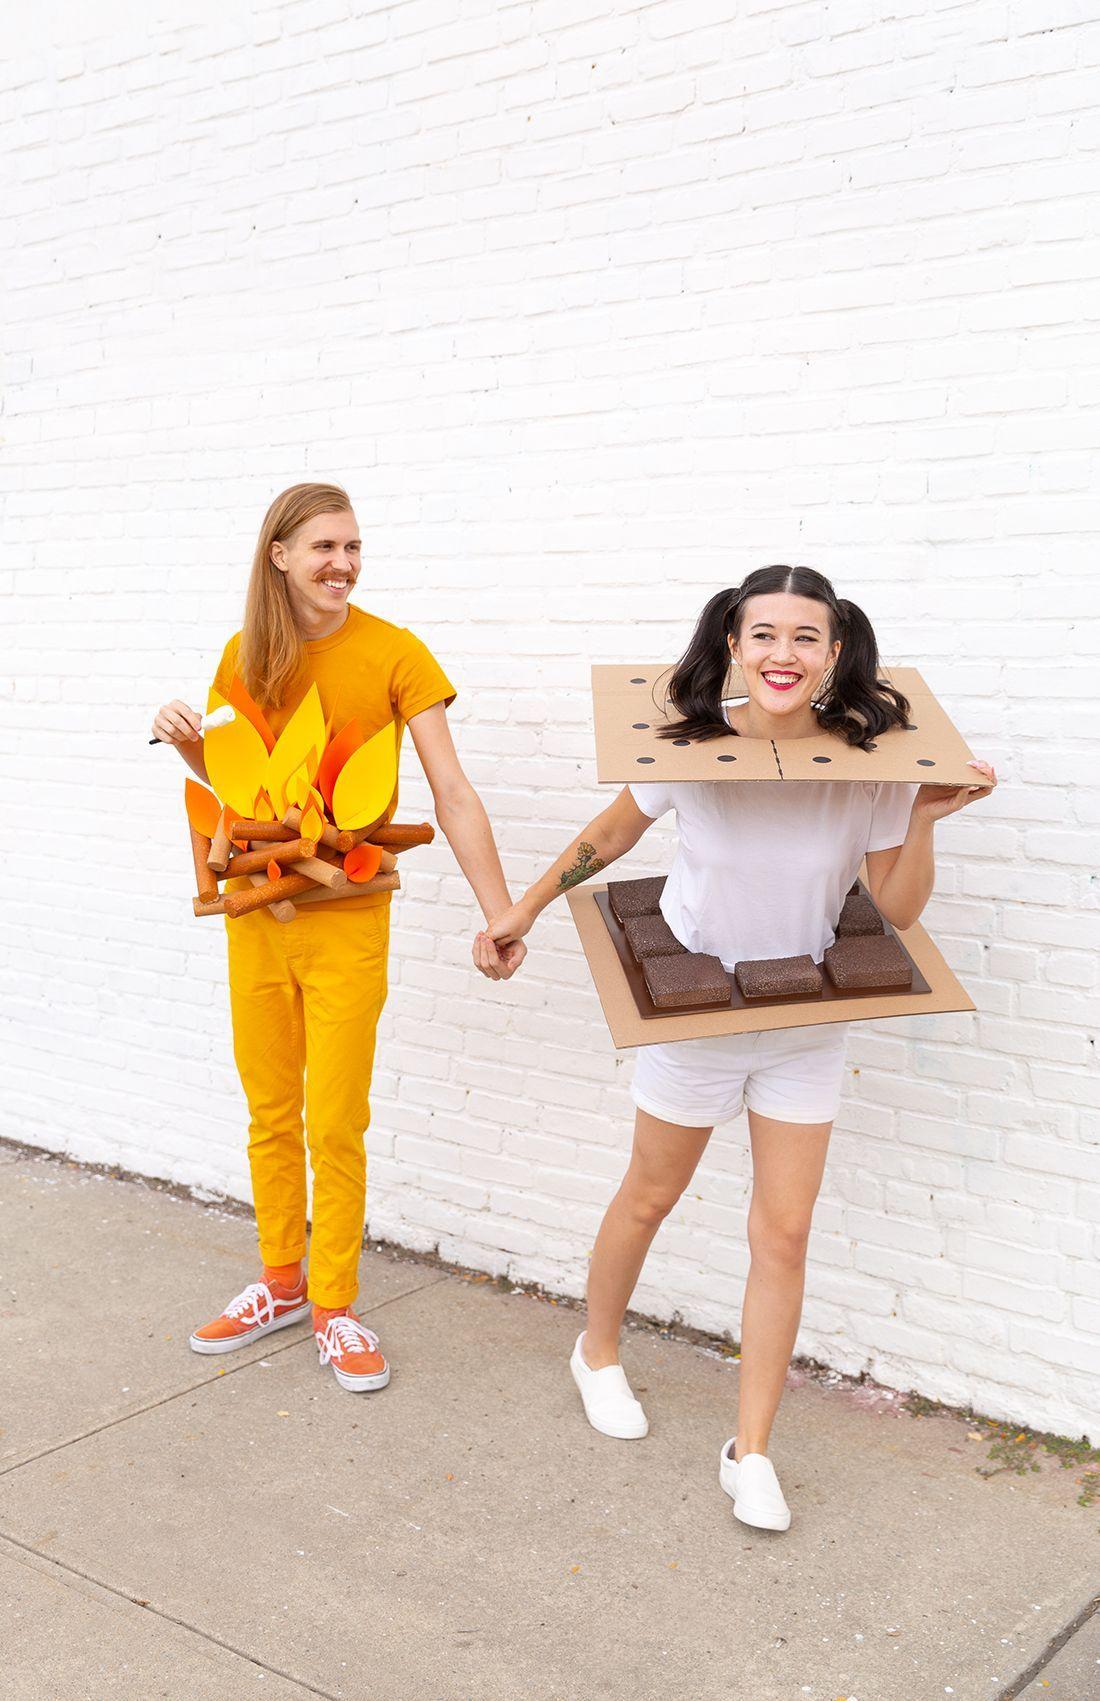 Easy Couple Halloween Costume Ideas.45 Best Couples Halloween Costume Ideas 2021 Easy Couple Costume Ideas